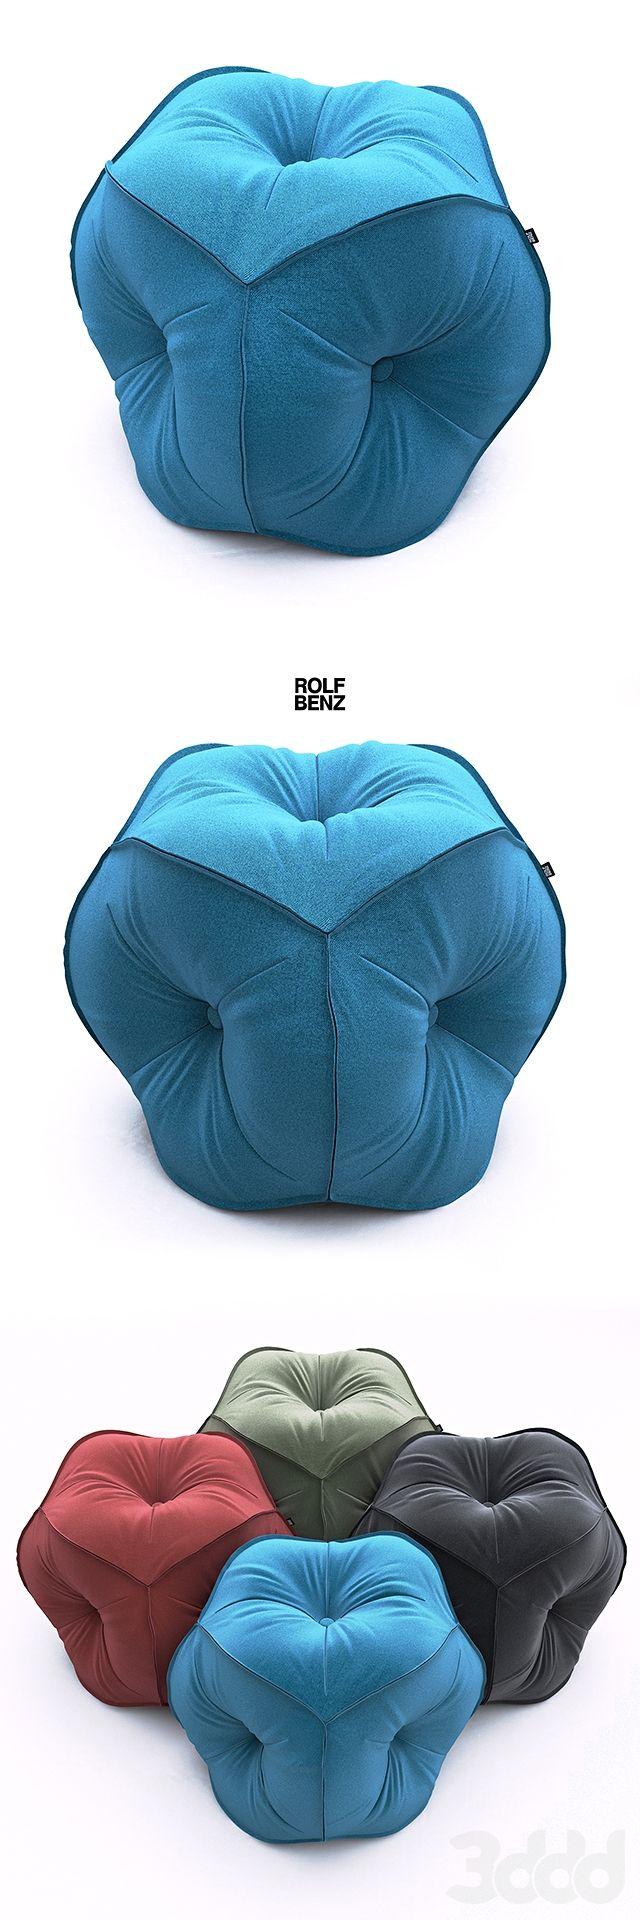 Rolf Benz 953 Footstool   sofa   Pinterest   Wohnzimmer